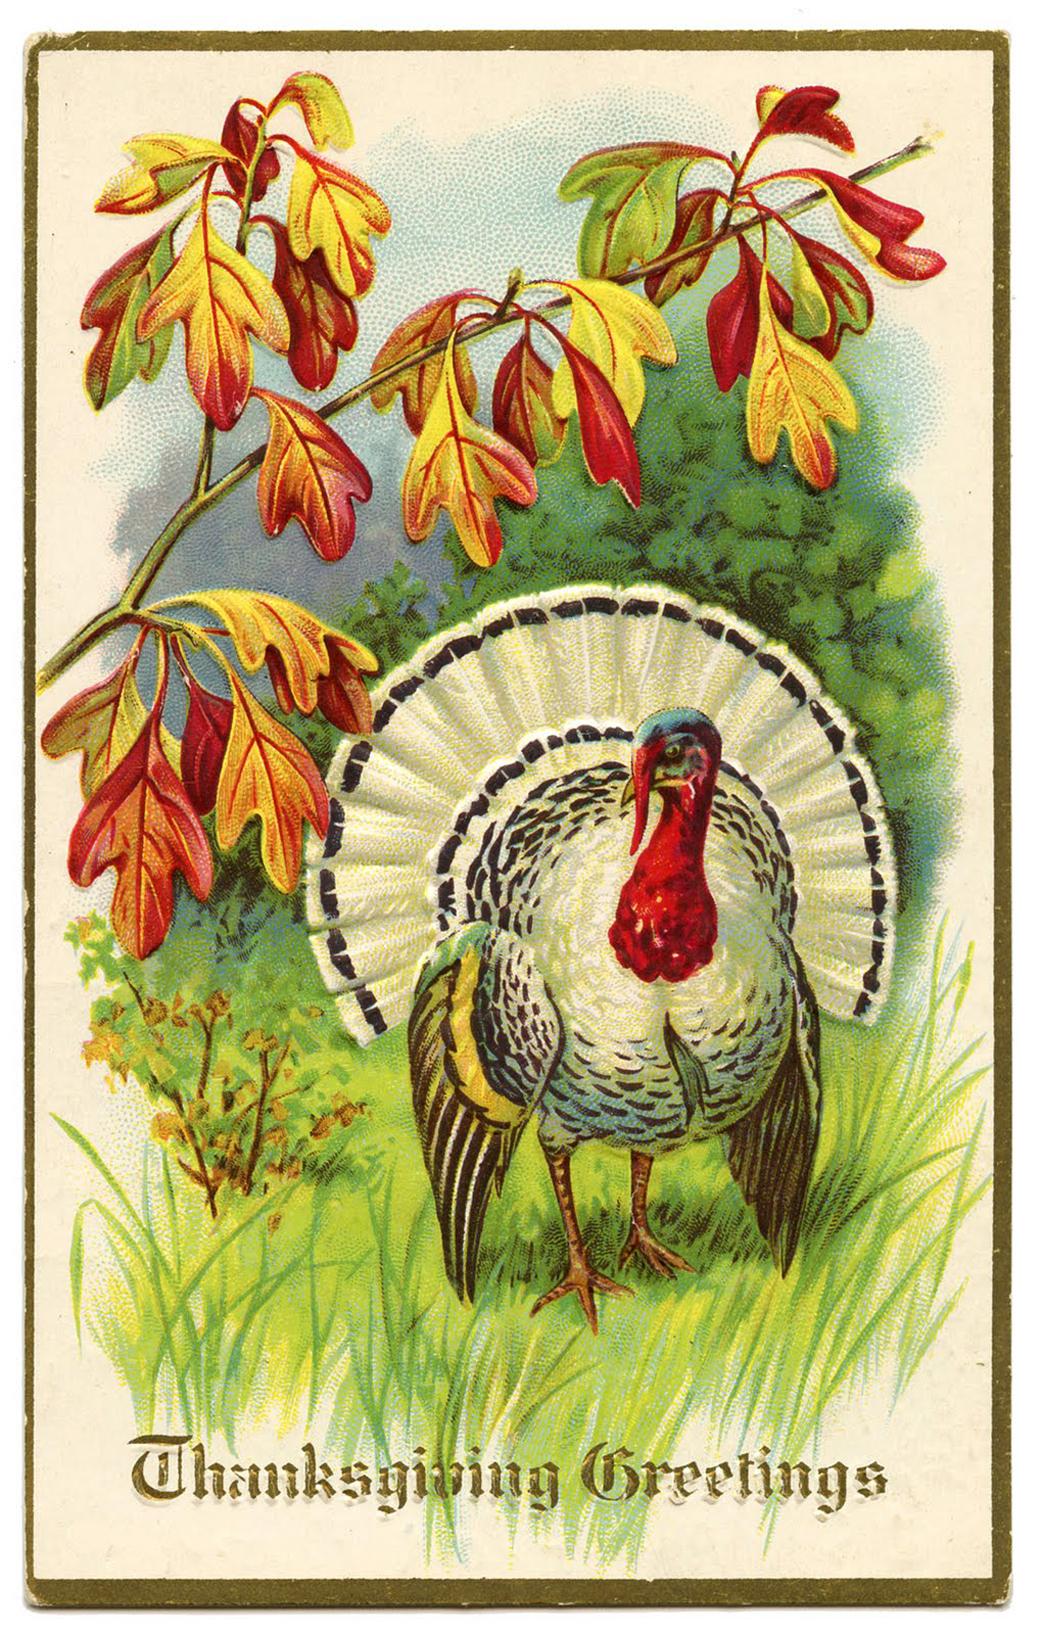 5 White Turkey Images - Vintage Thanksgiving! - The ...